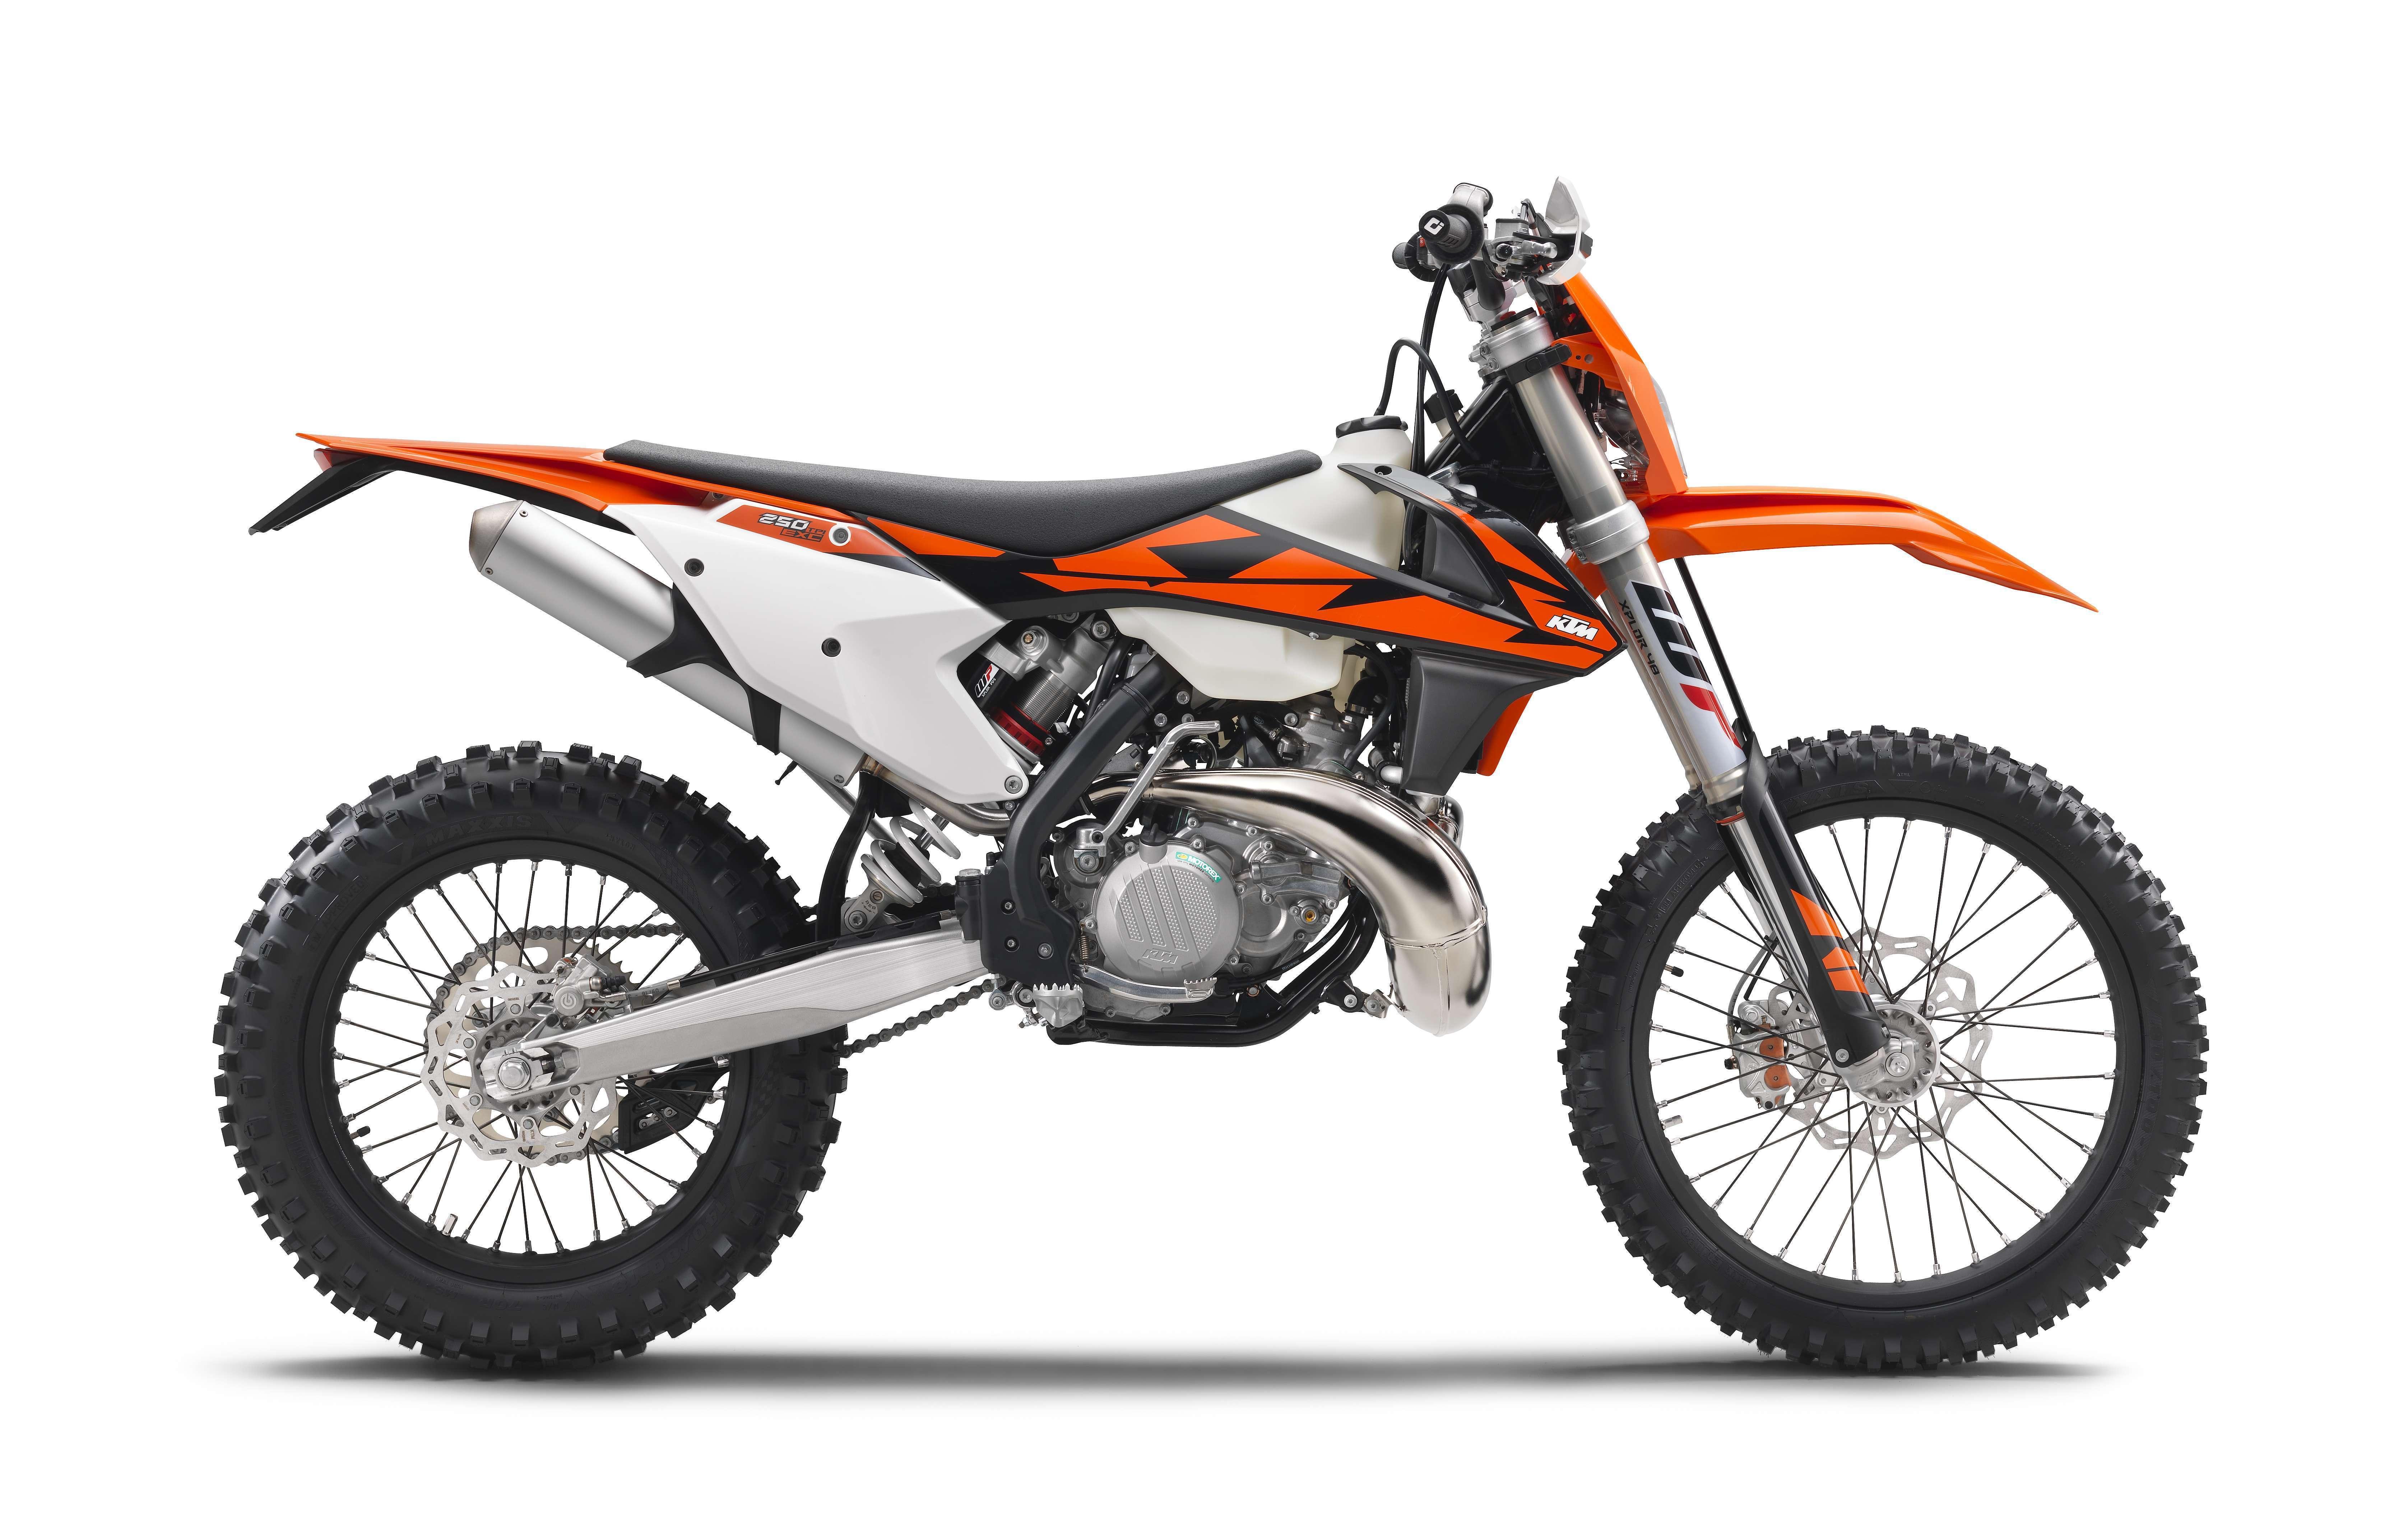 Choisir son modèle KTM Enduro